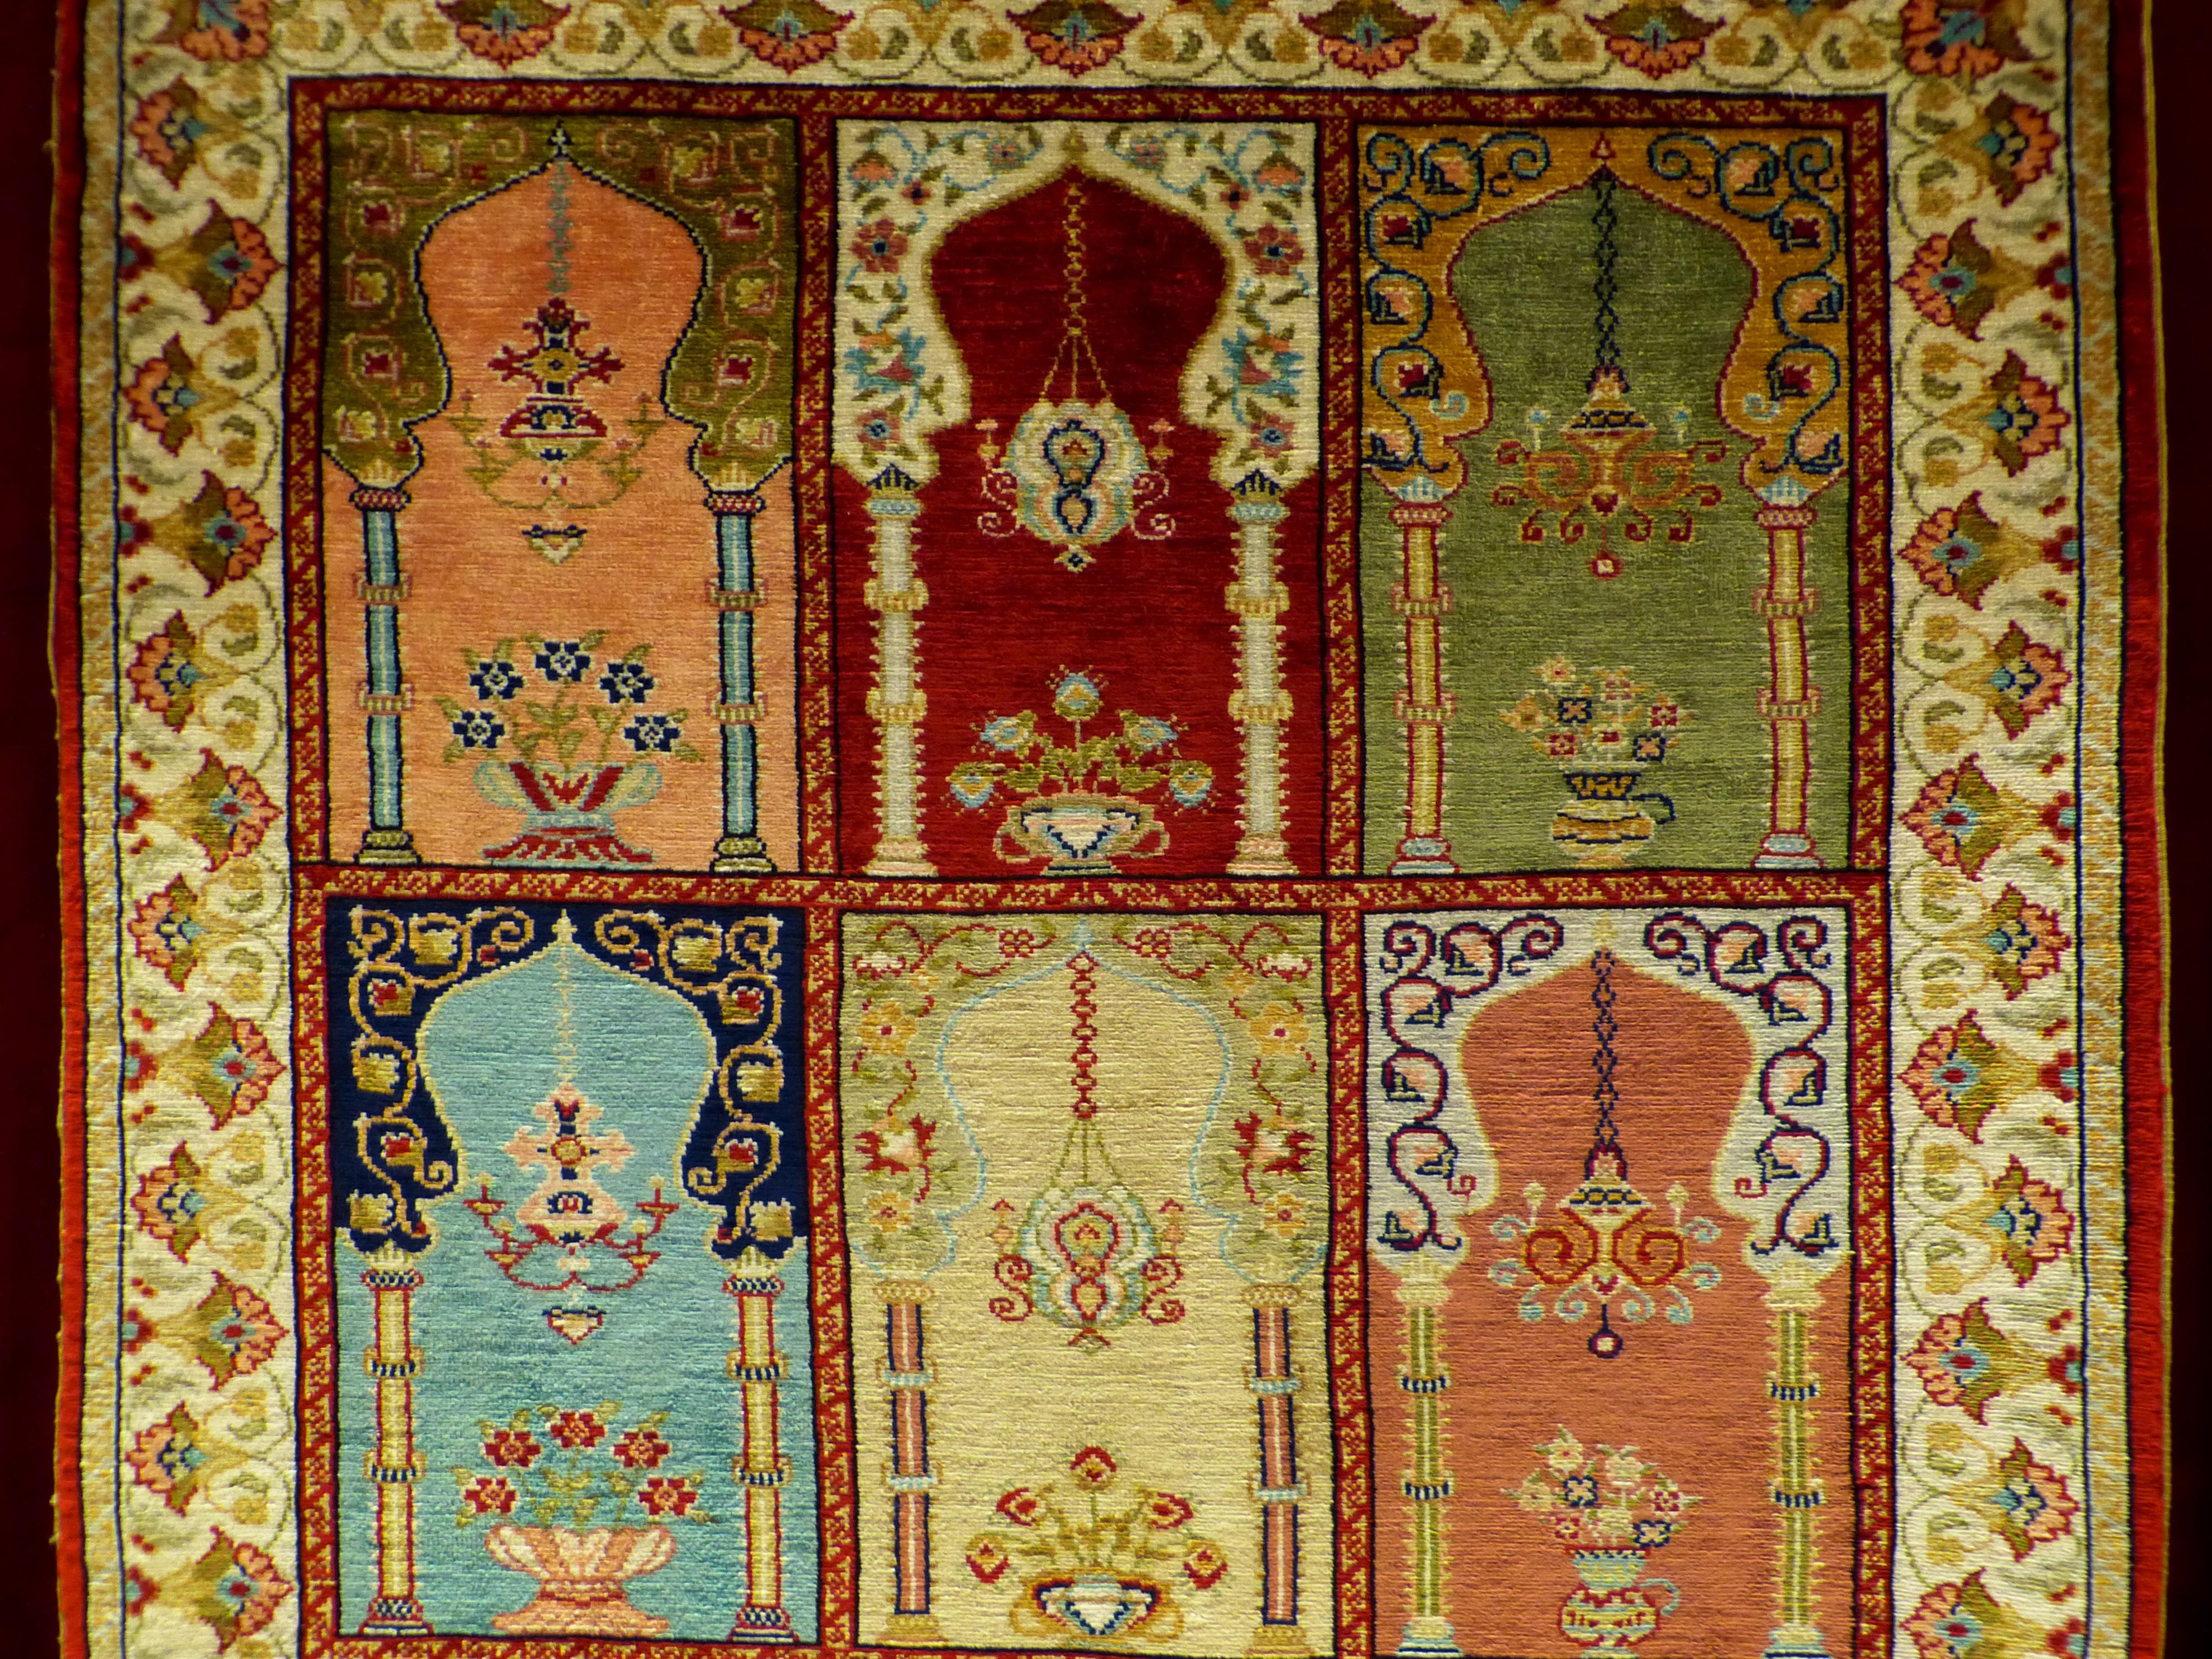 Gambar Pola Permadani Kerajinan Tekstil Seni Desain